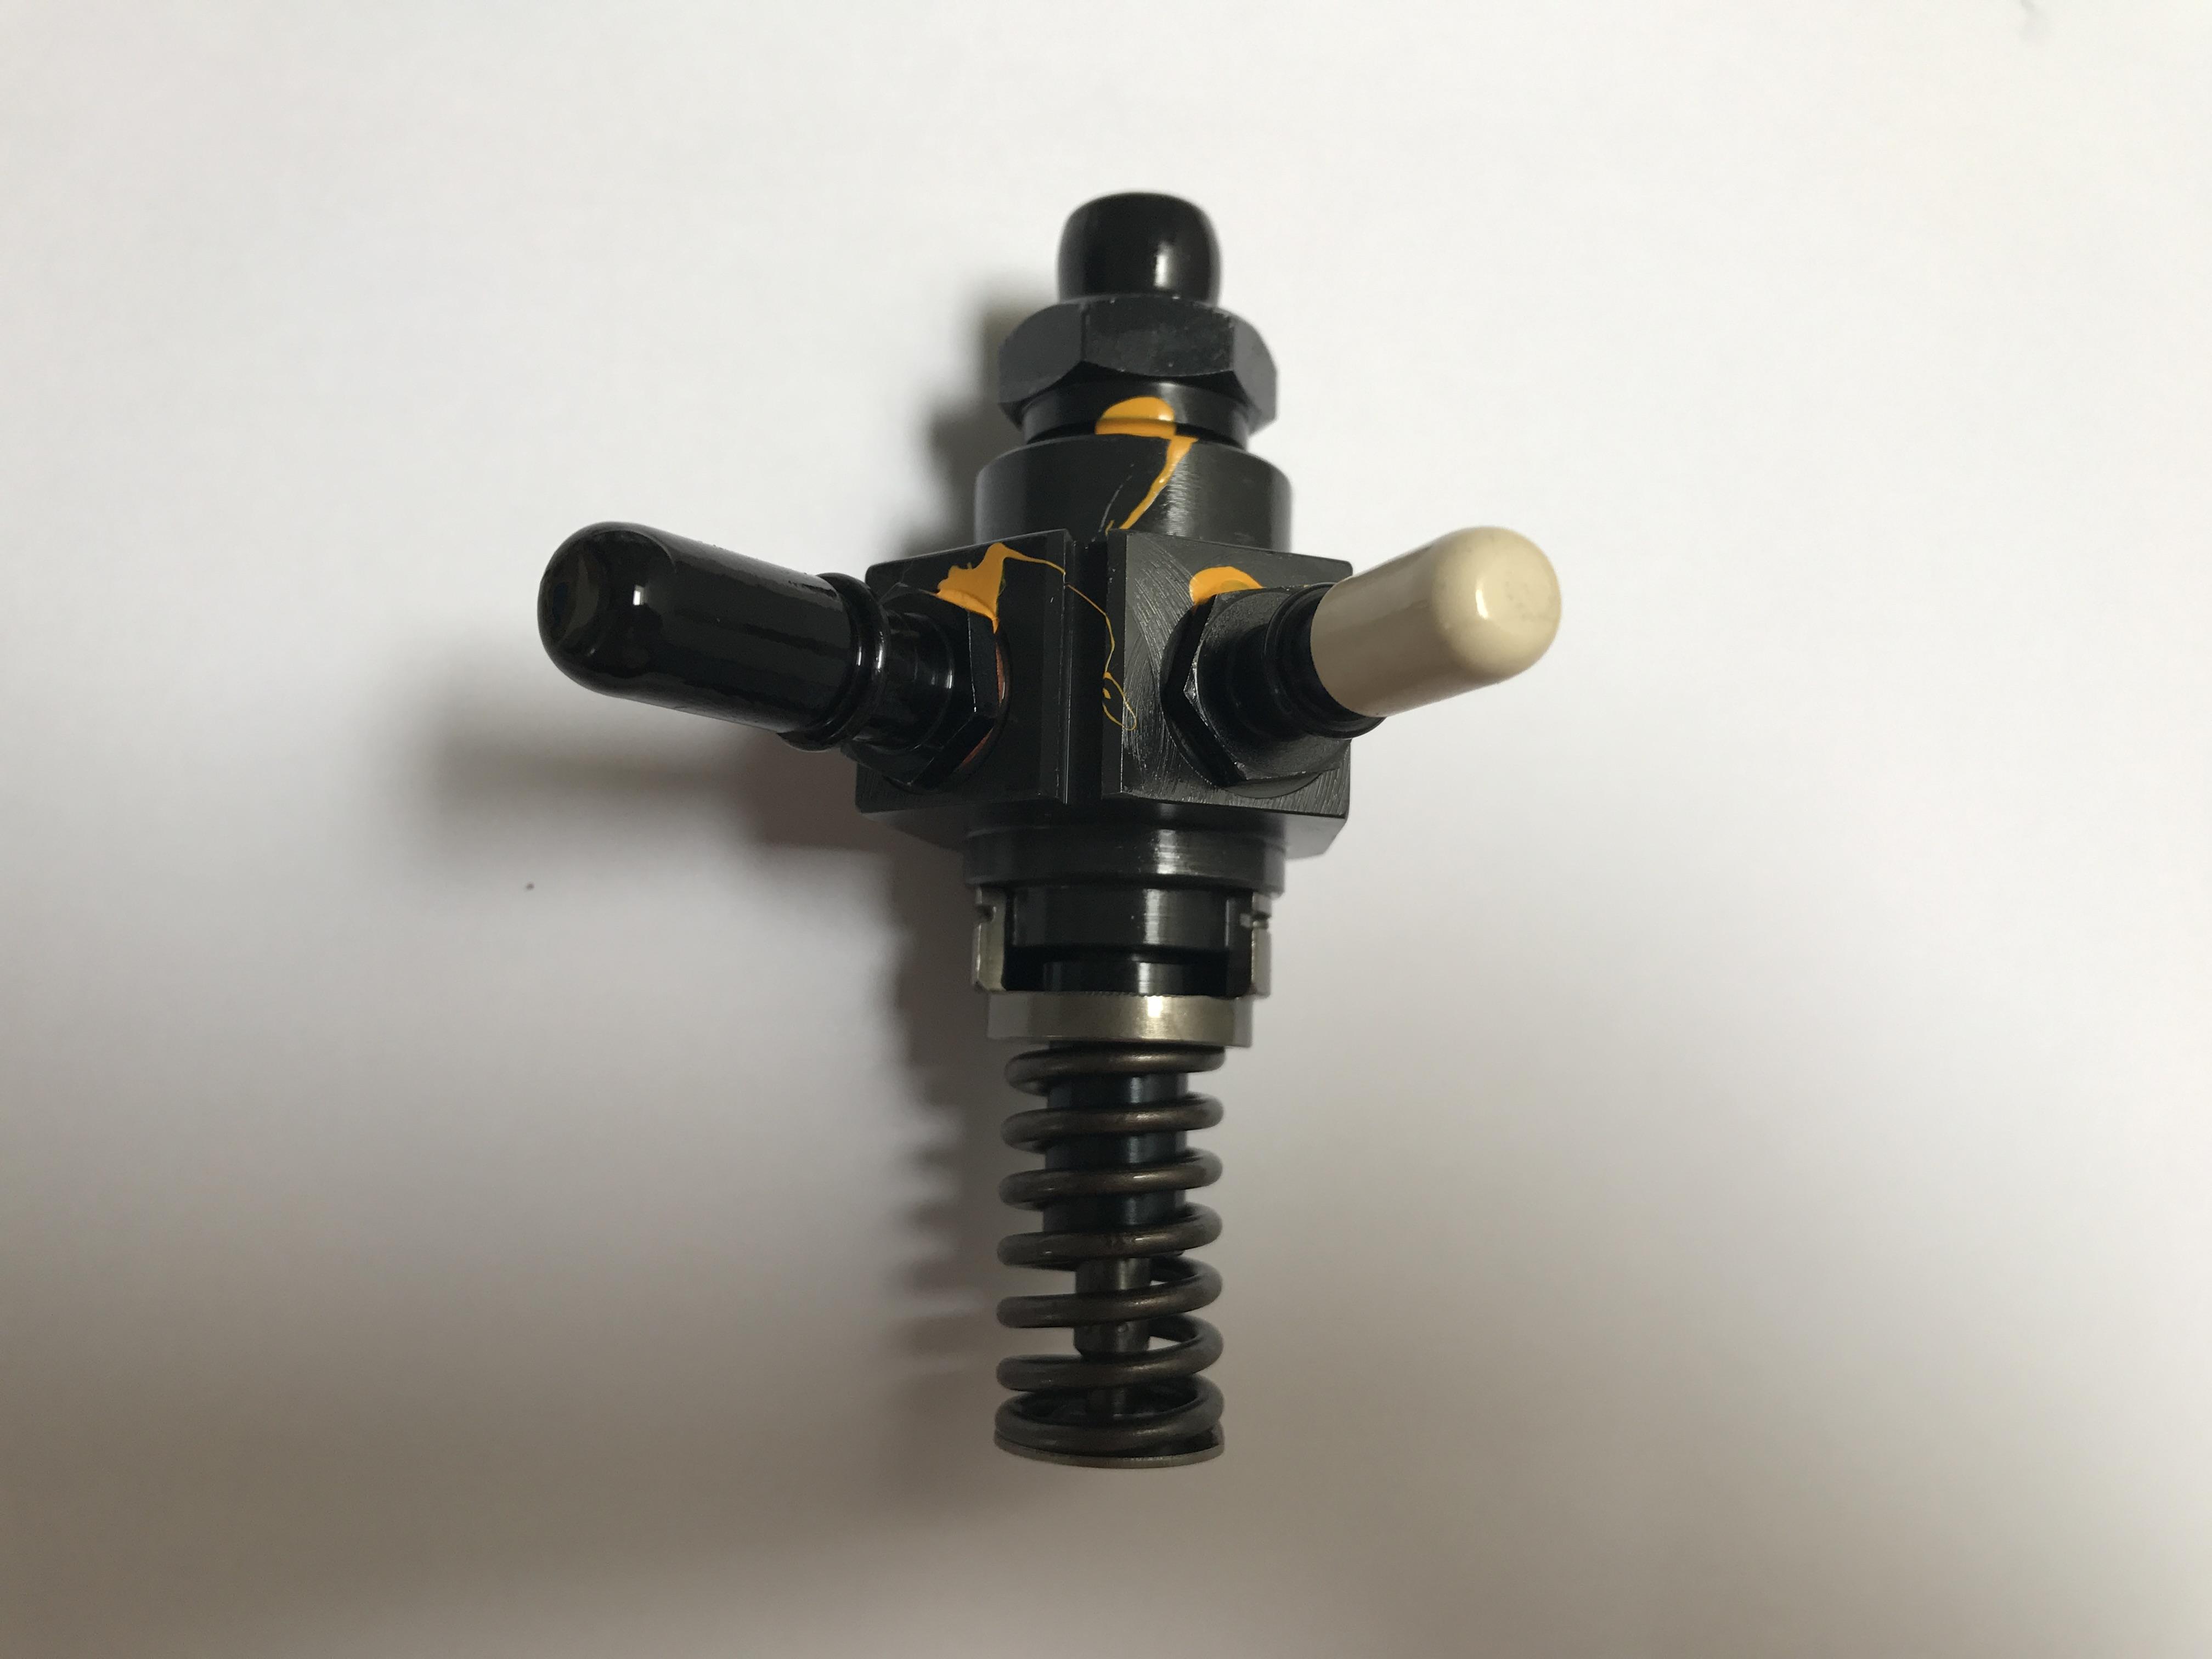 Pompe injection LOMBARDINI LDW442 LDW442CRS LDW492 LDW492 DCi- 6590438 ED0065904380-S BOSCH 0414651999